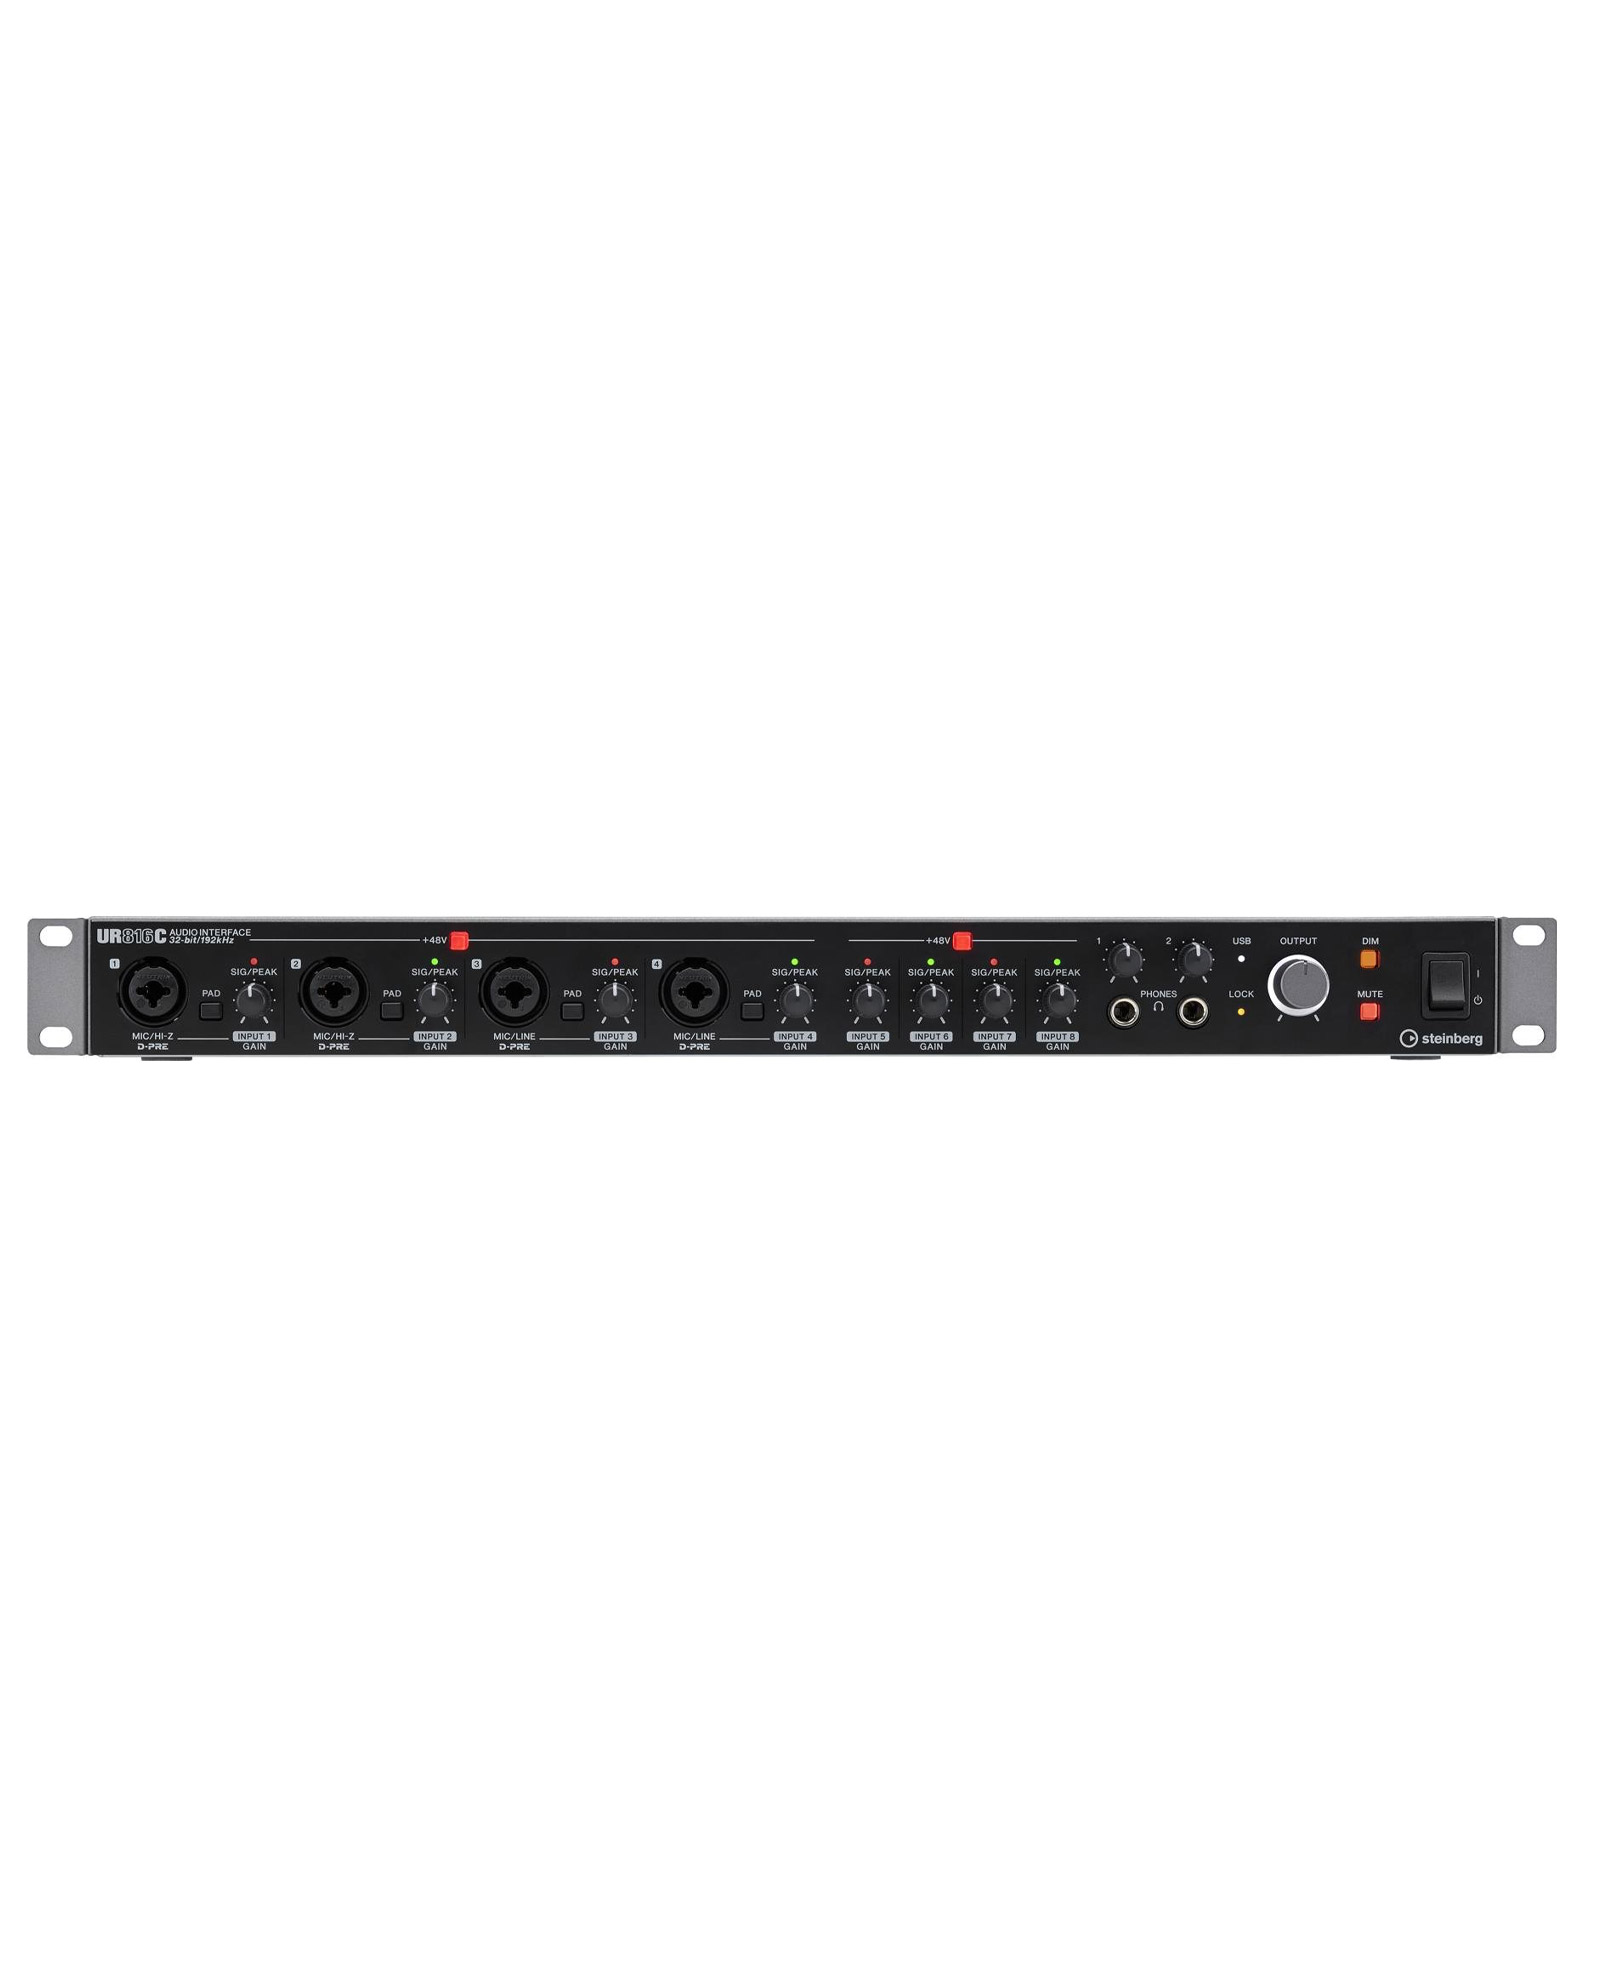 Steinberg Ur816c 16 X 16 Usb 3.0 Audio Interface Front